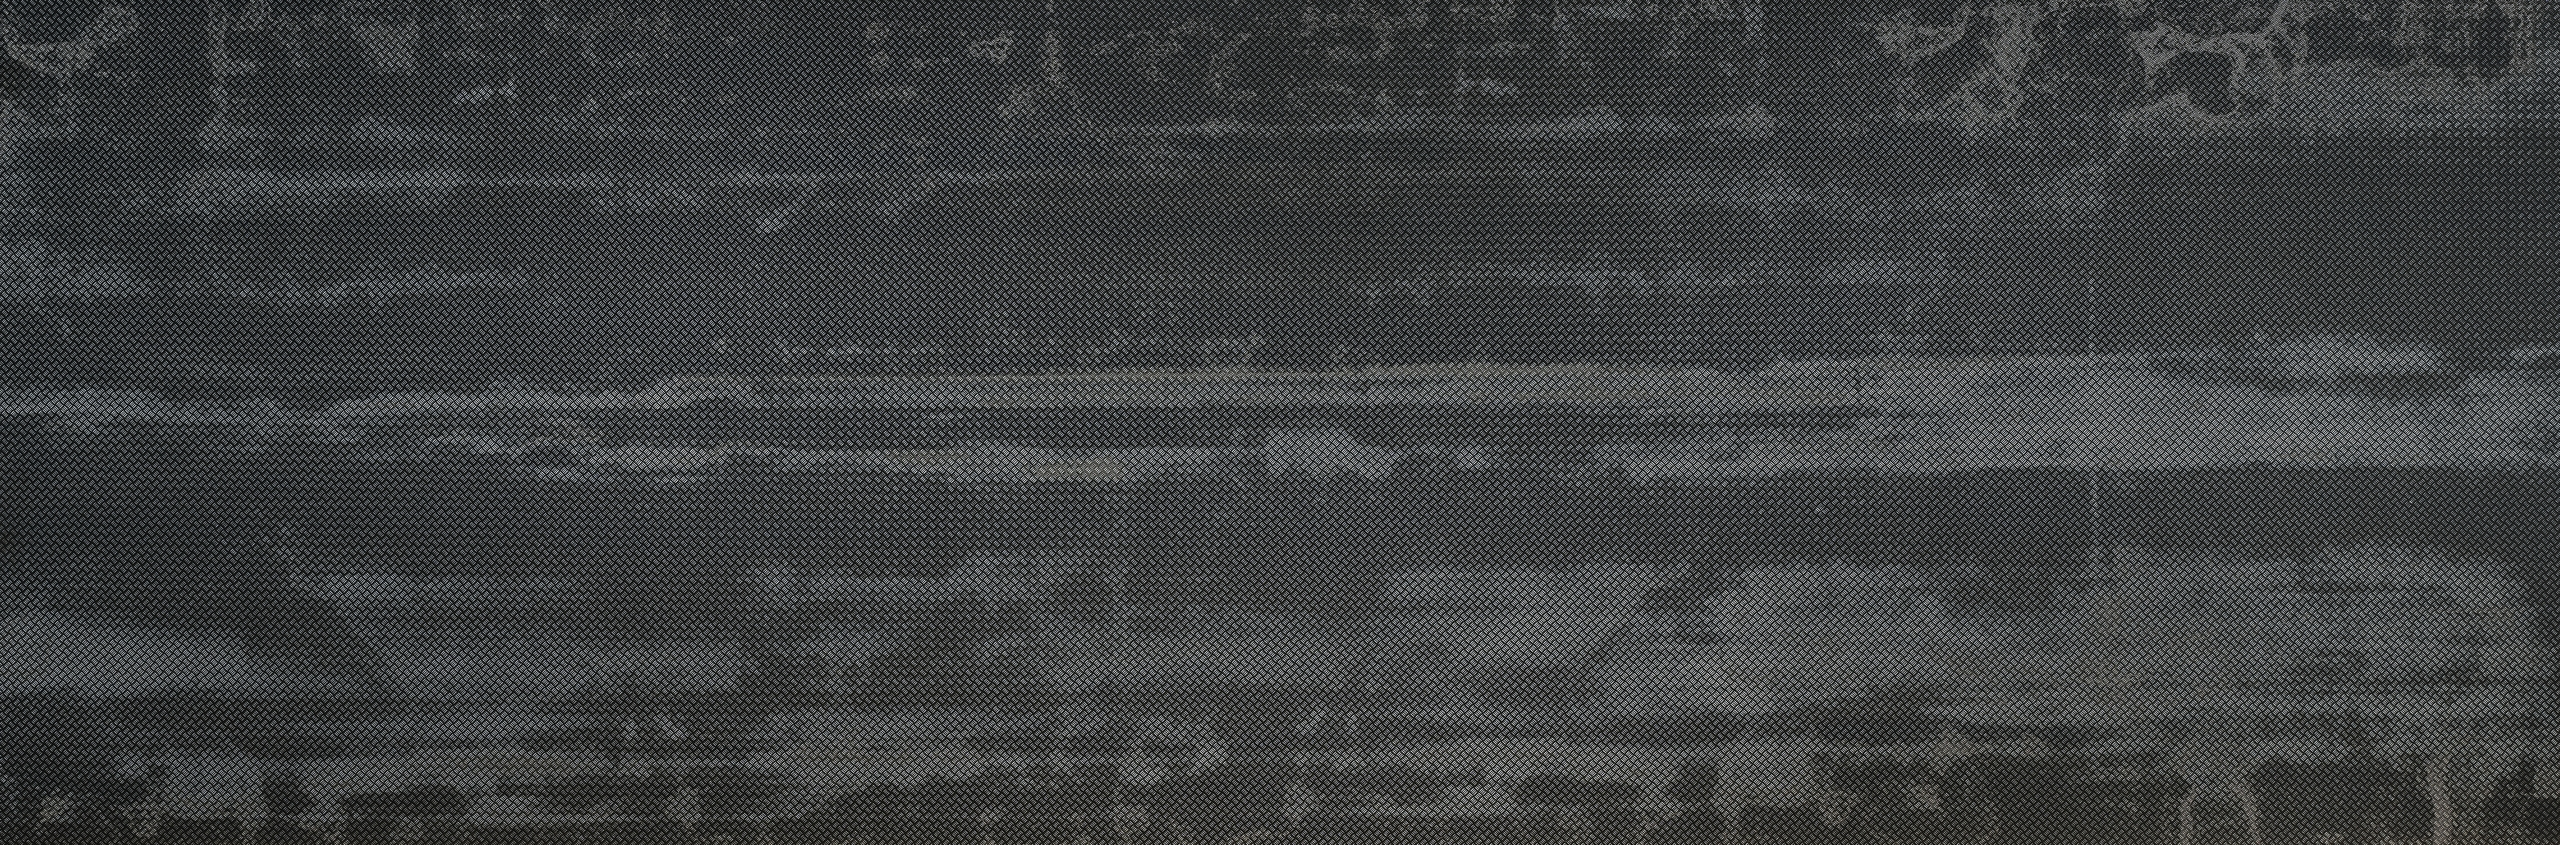 Plutonio ossidiato